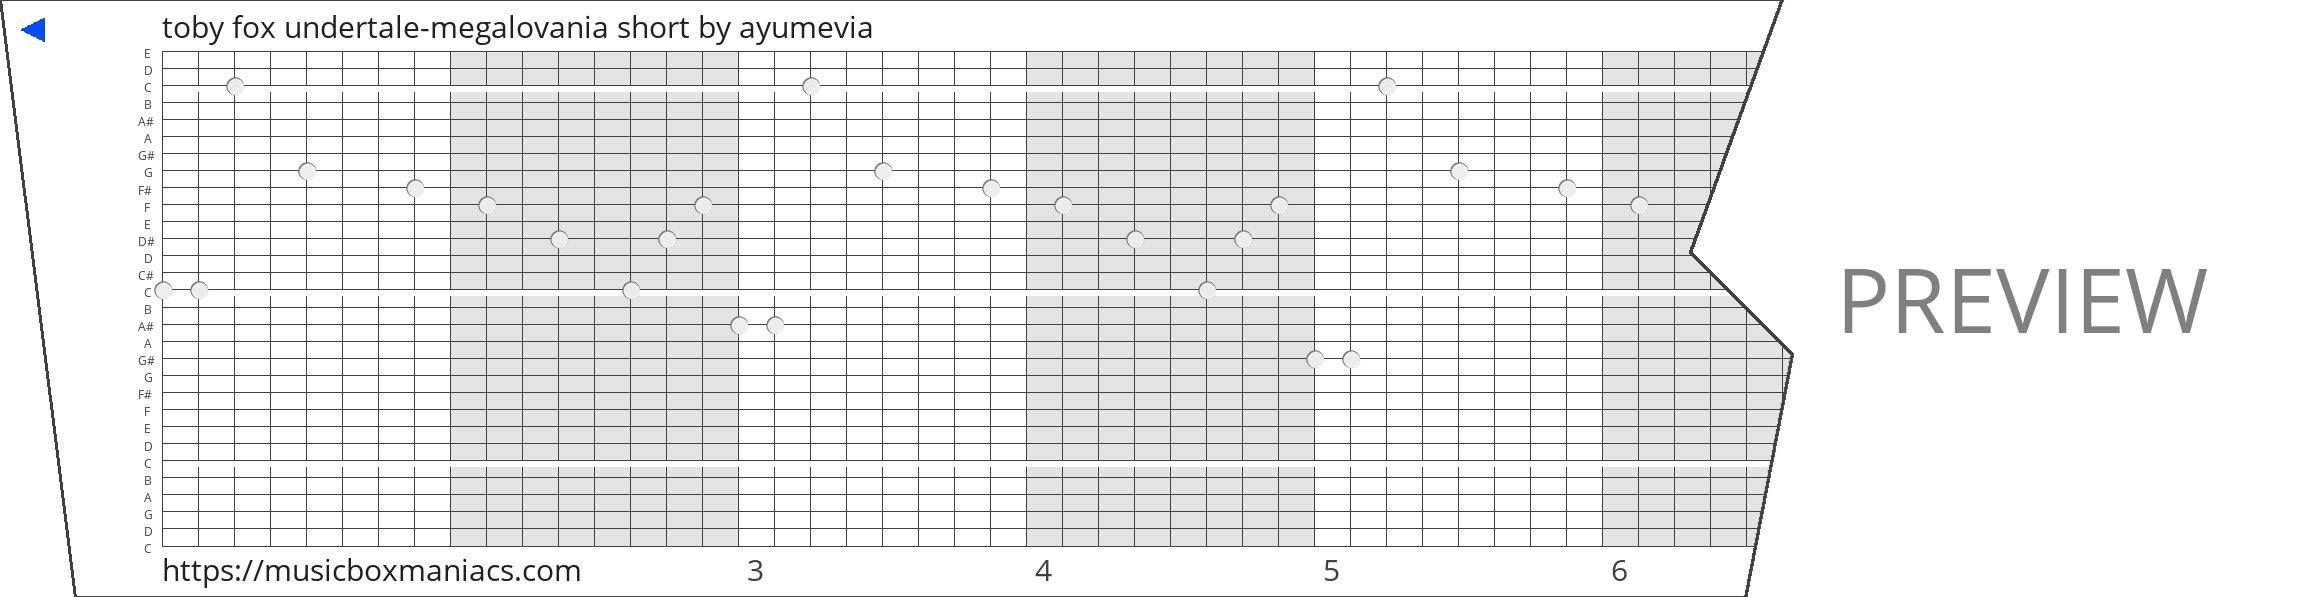 toby fox undertale-megalovania short 30 note music box paper strip